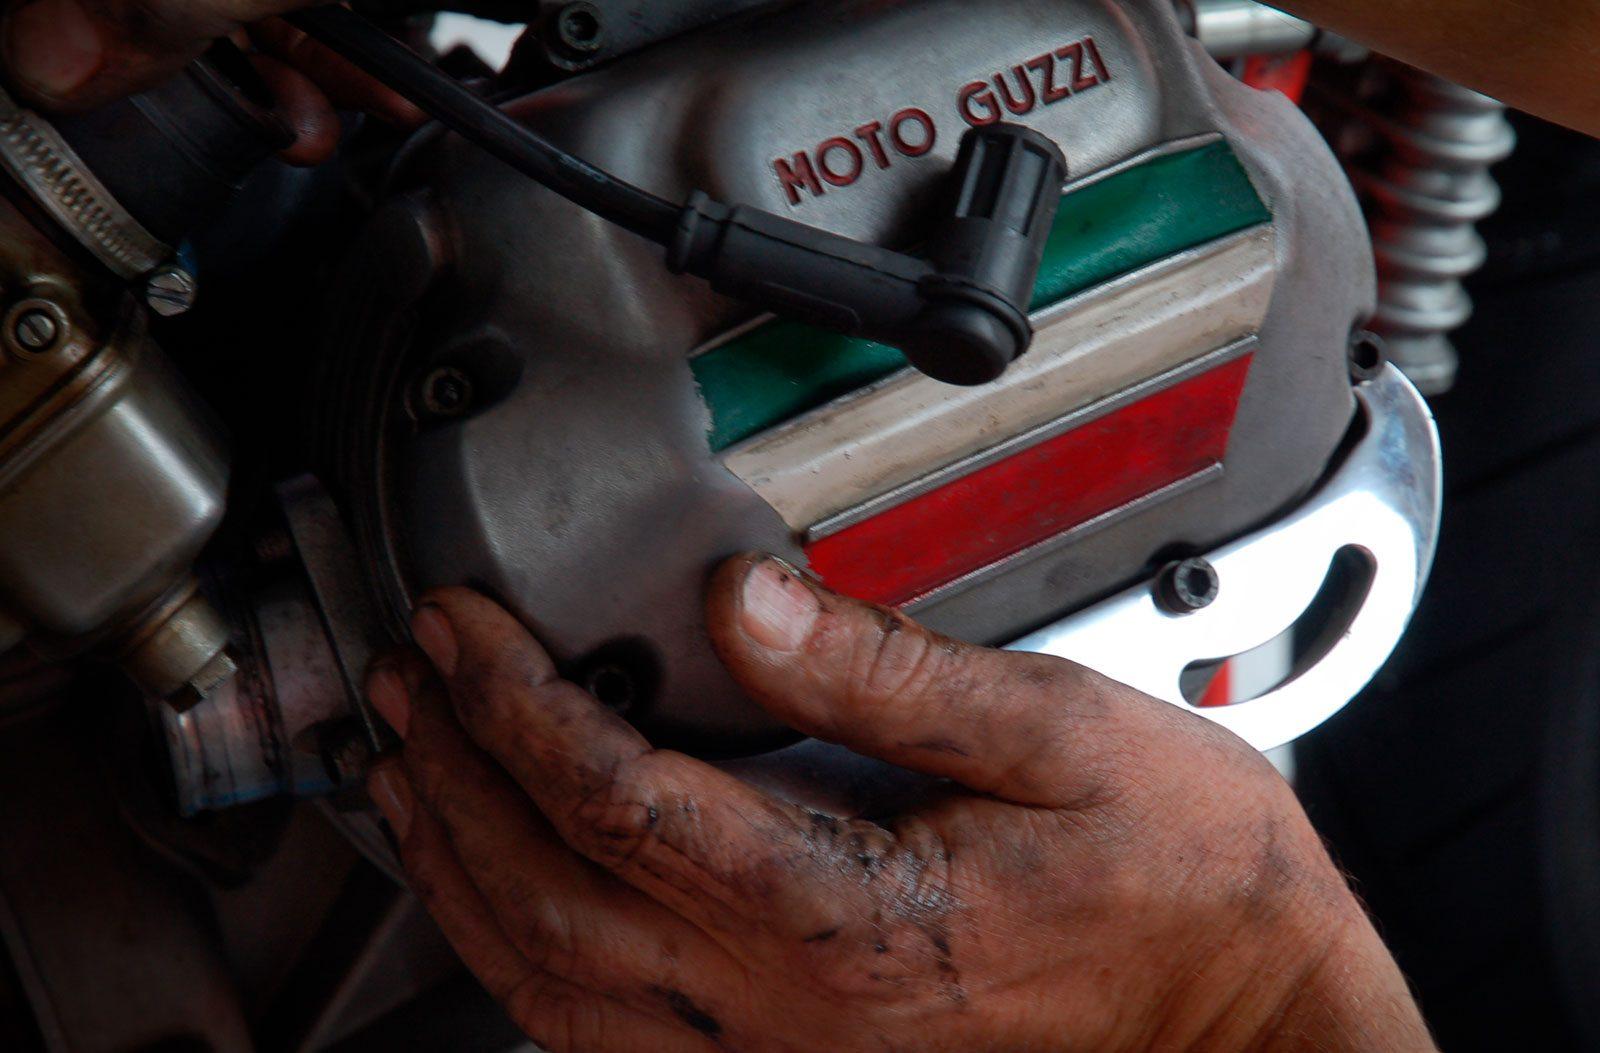 alberto sala writer pictures motorcycles endurance moto guzzi